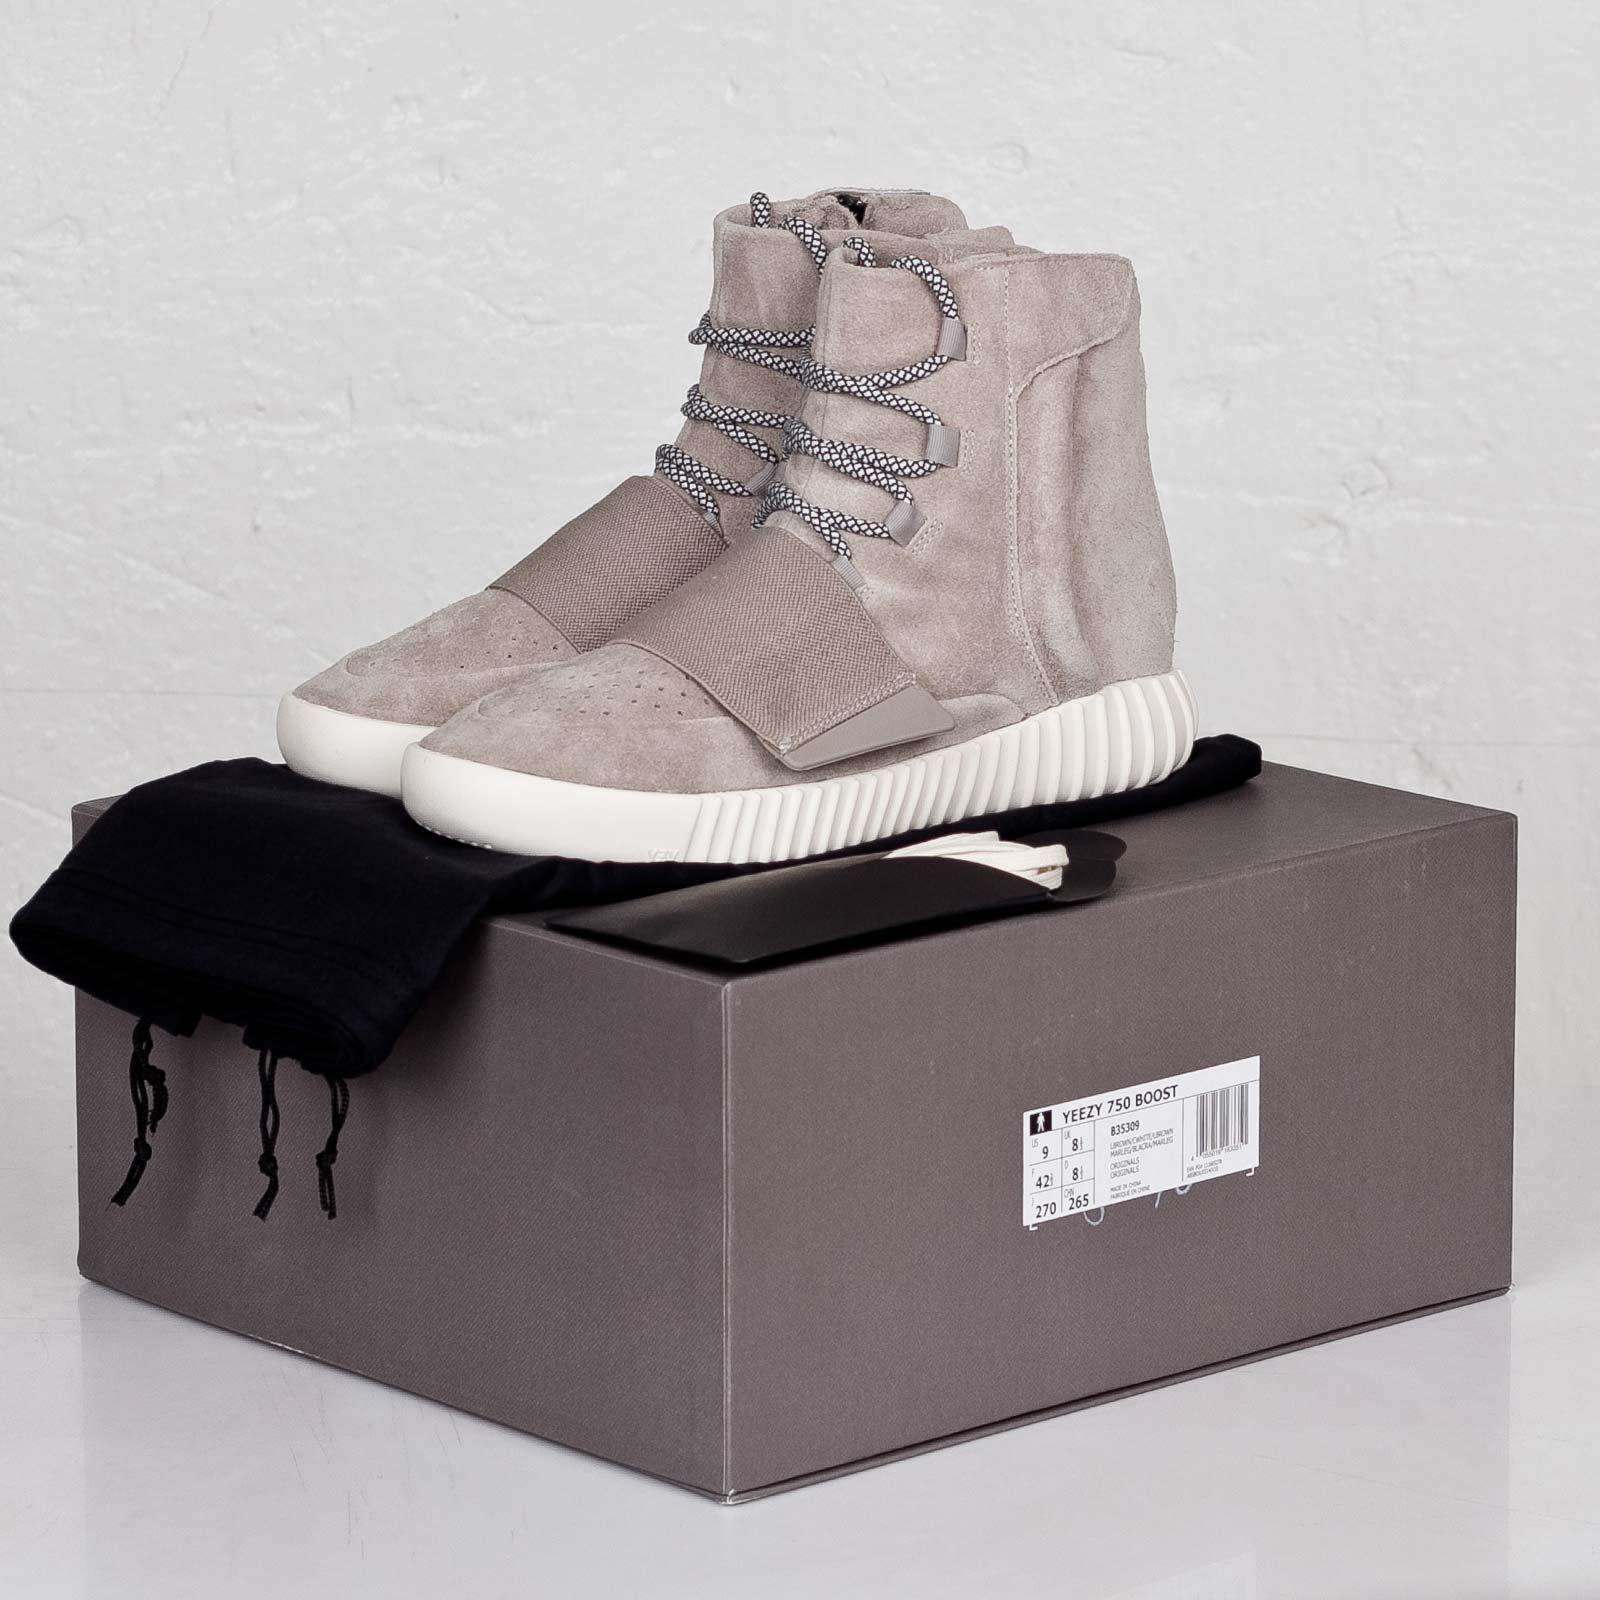 5e664c7ca ... adidas yeezy high cut